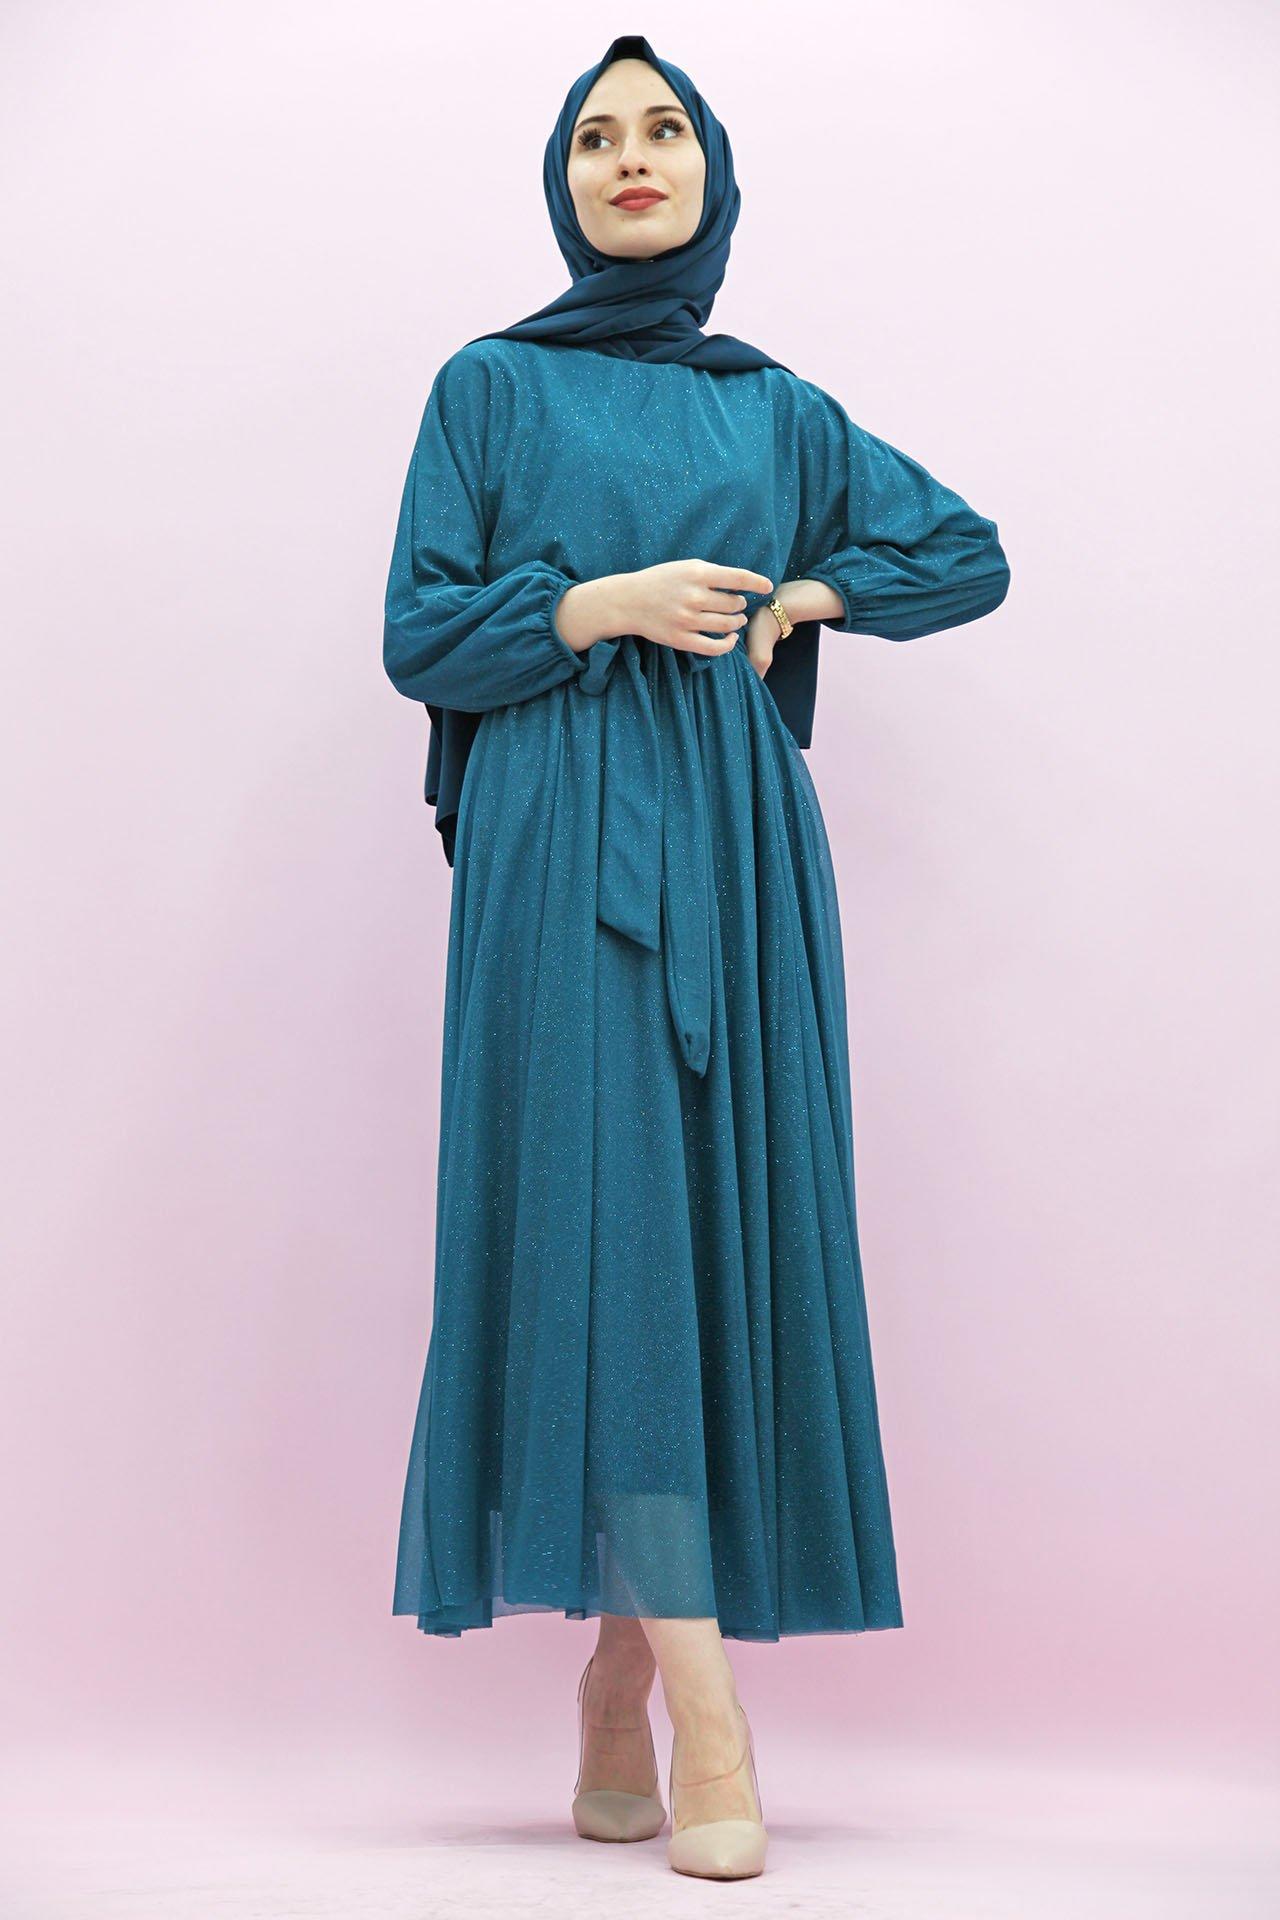 GİZAGİYİM - Simli Şifon Elbise Turkuaz